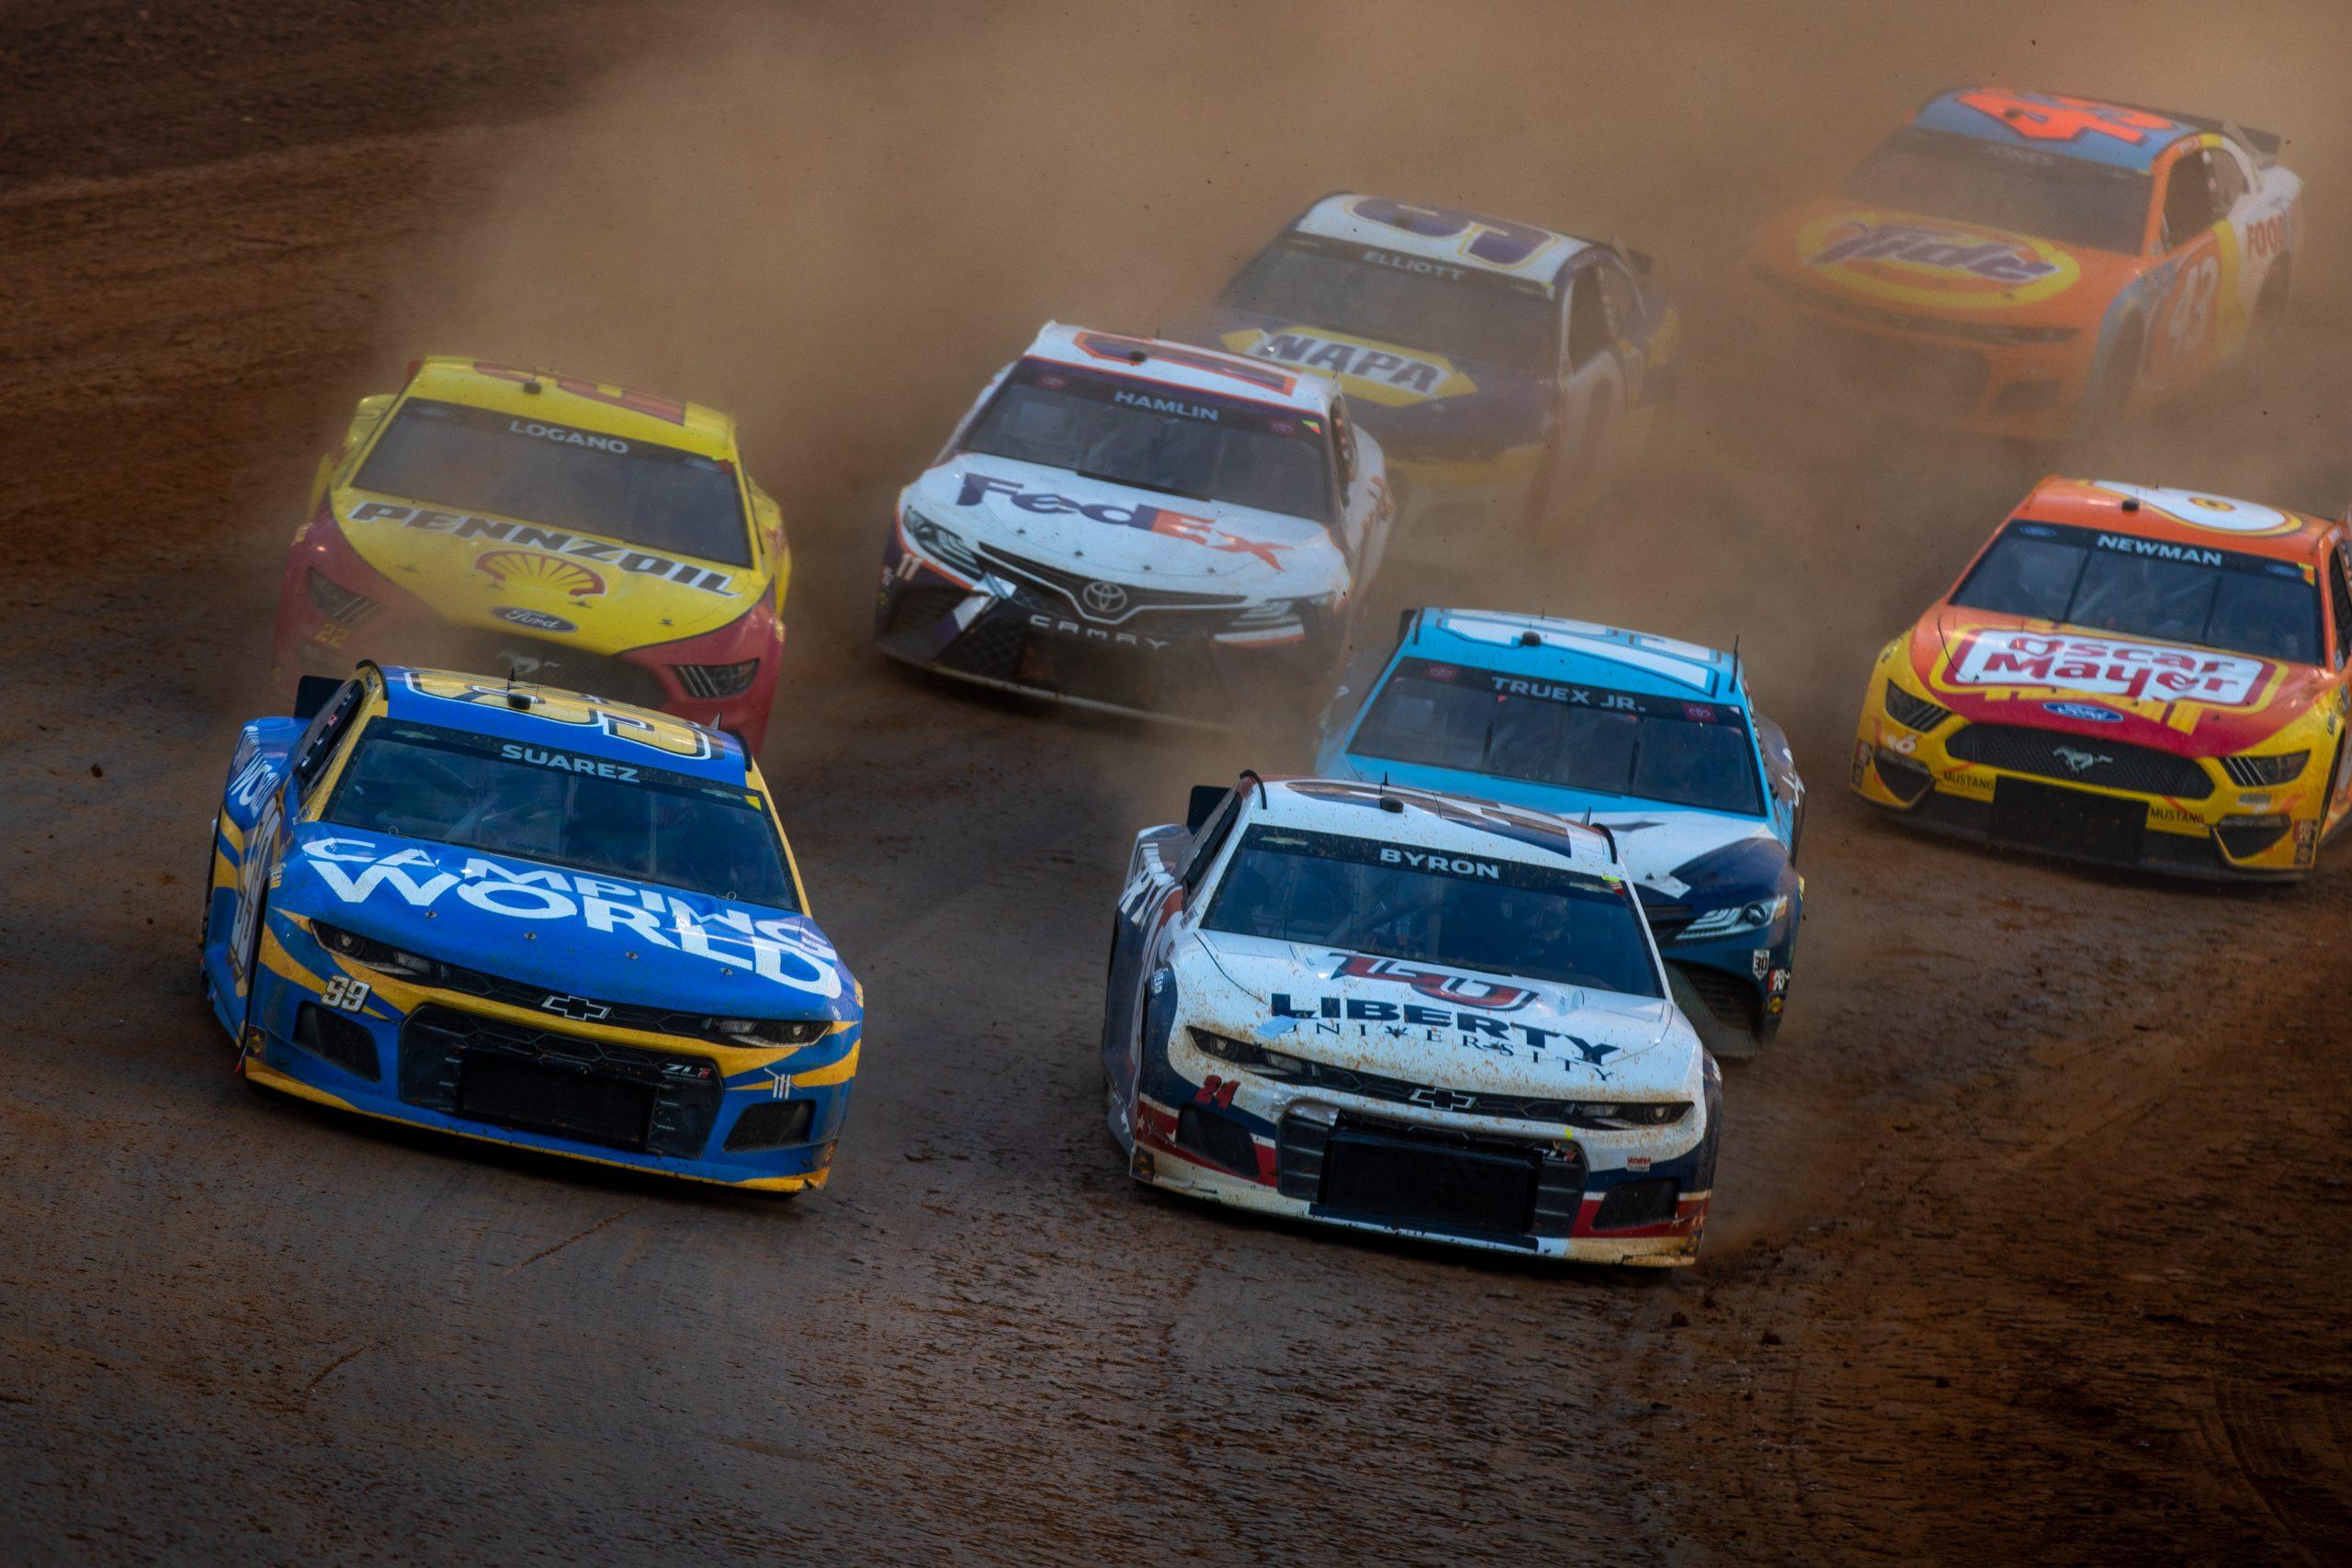 NASCAR Bristol dirt